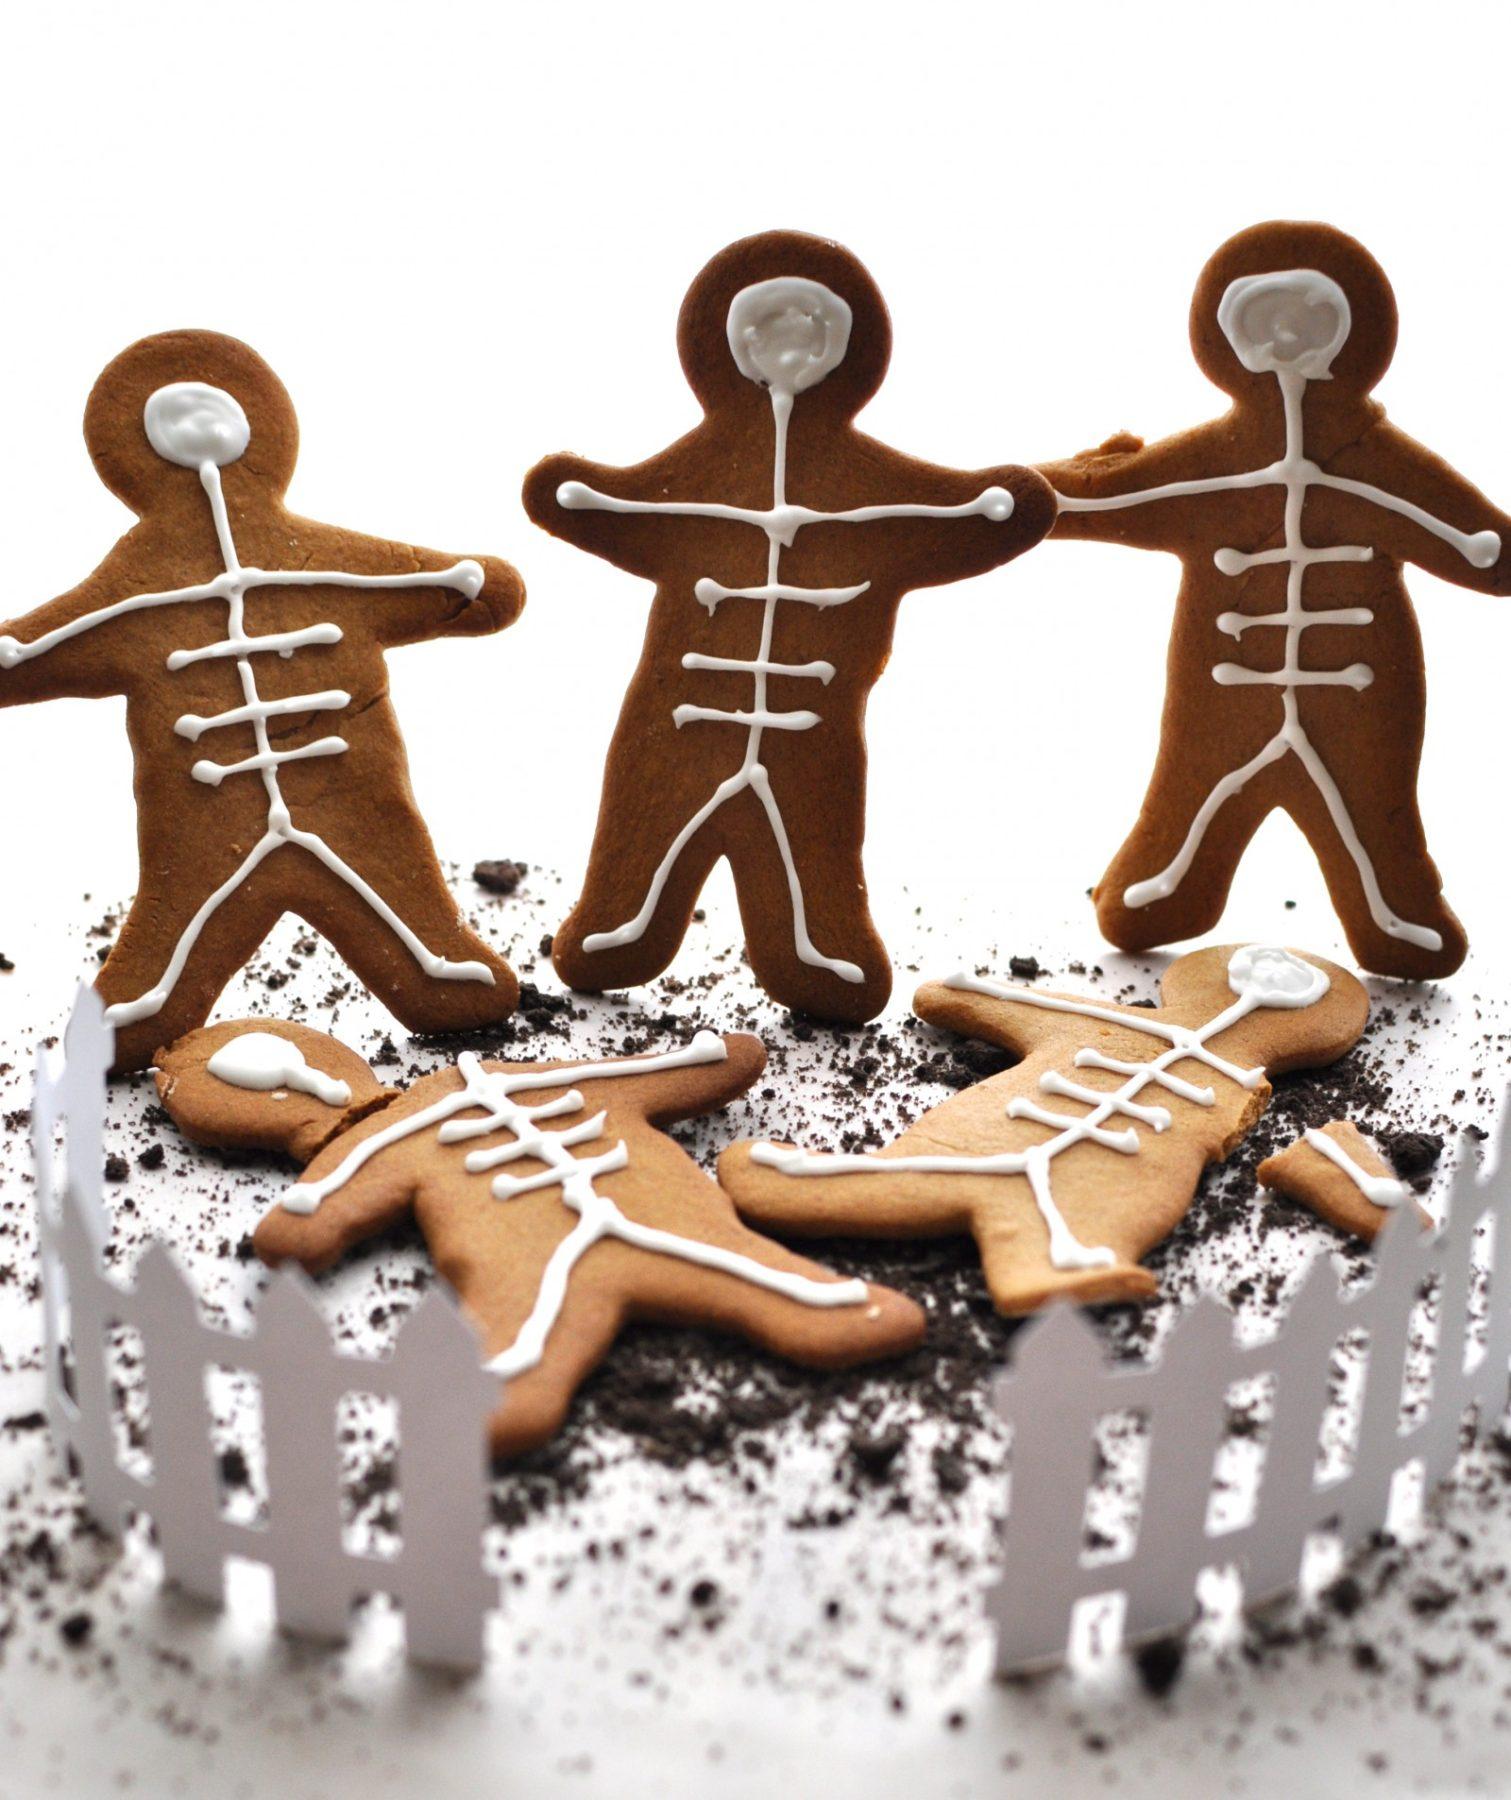 Spooktacular skeleton biscuits